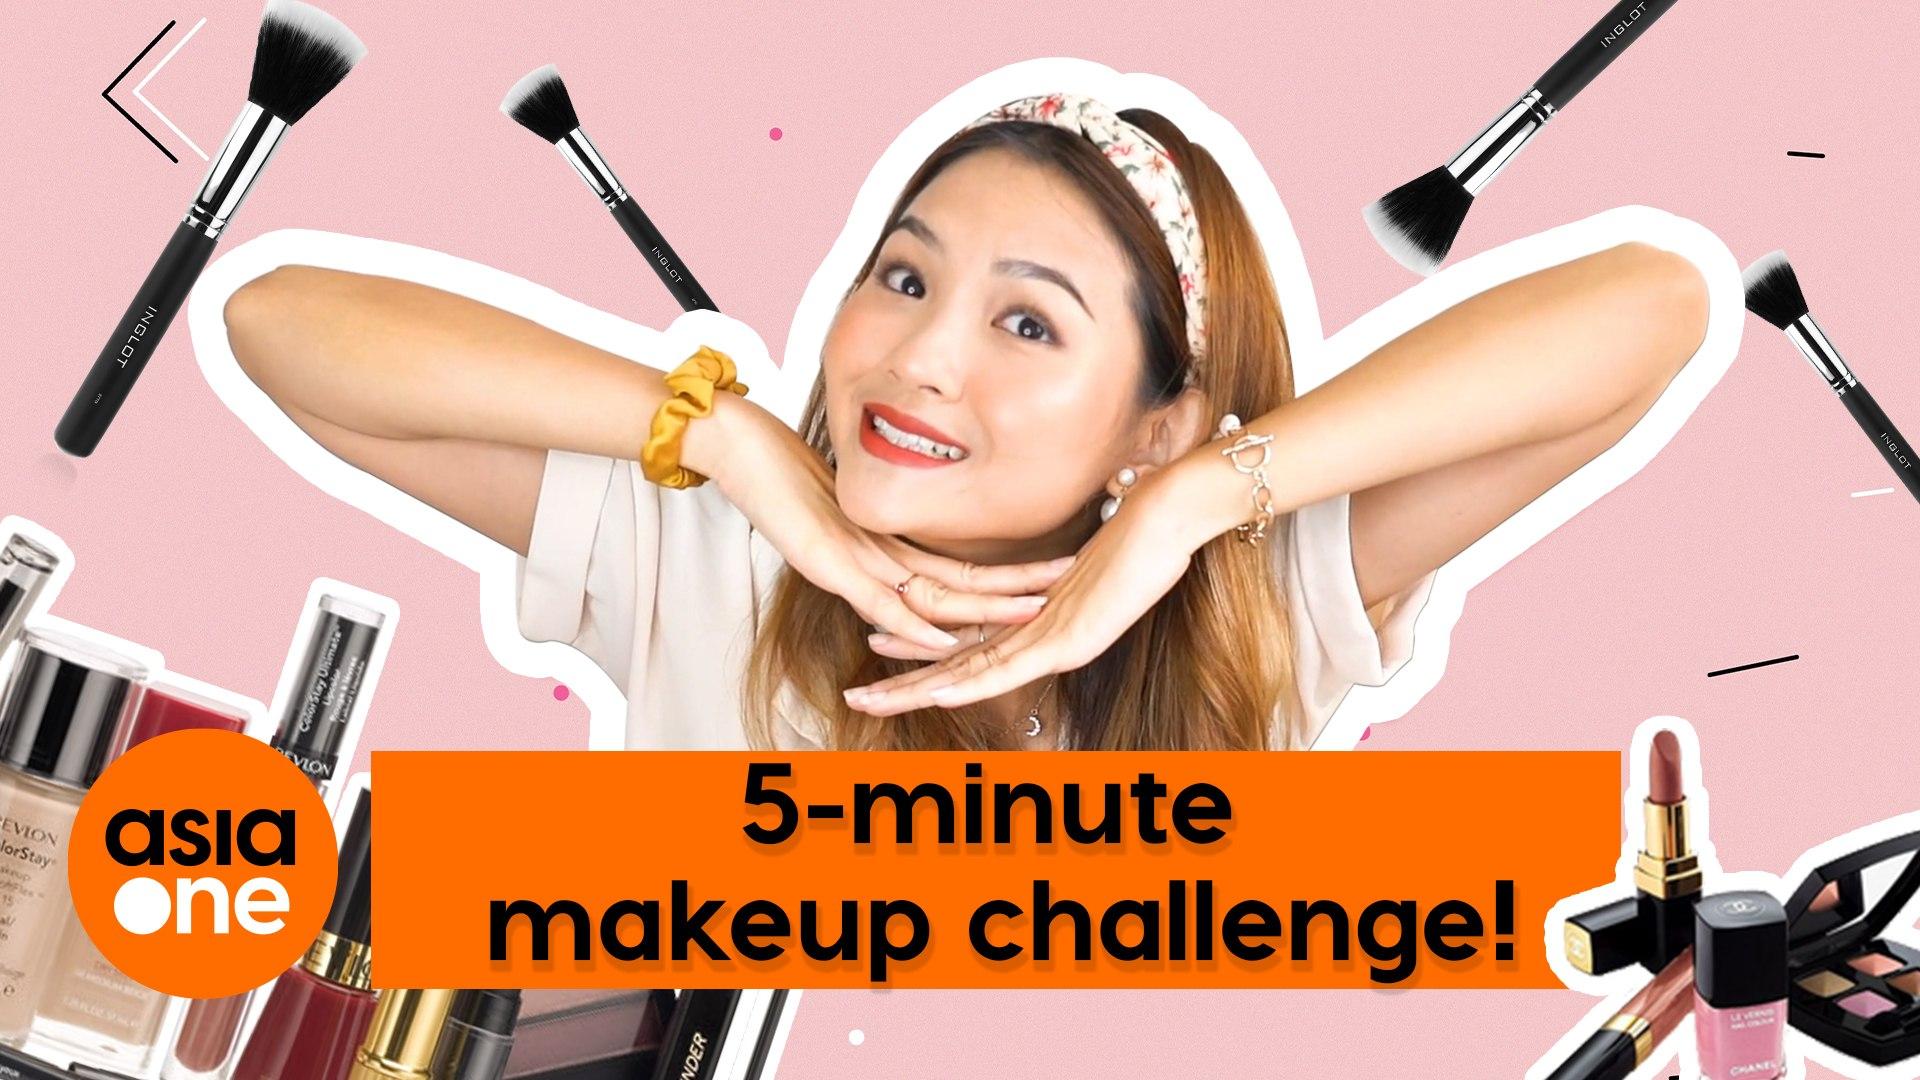 Feeling Fab: 5-minute makeup challenge!